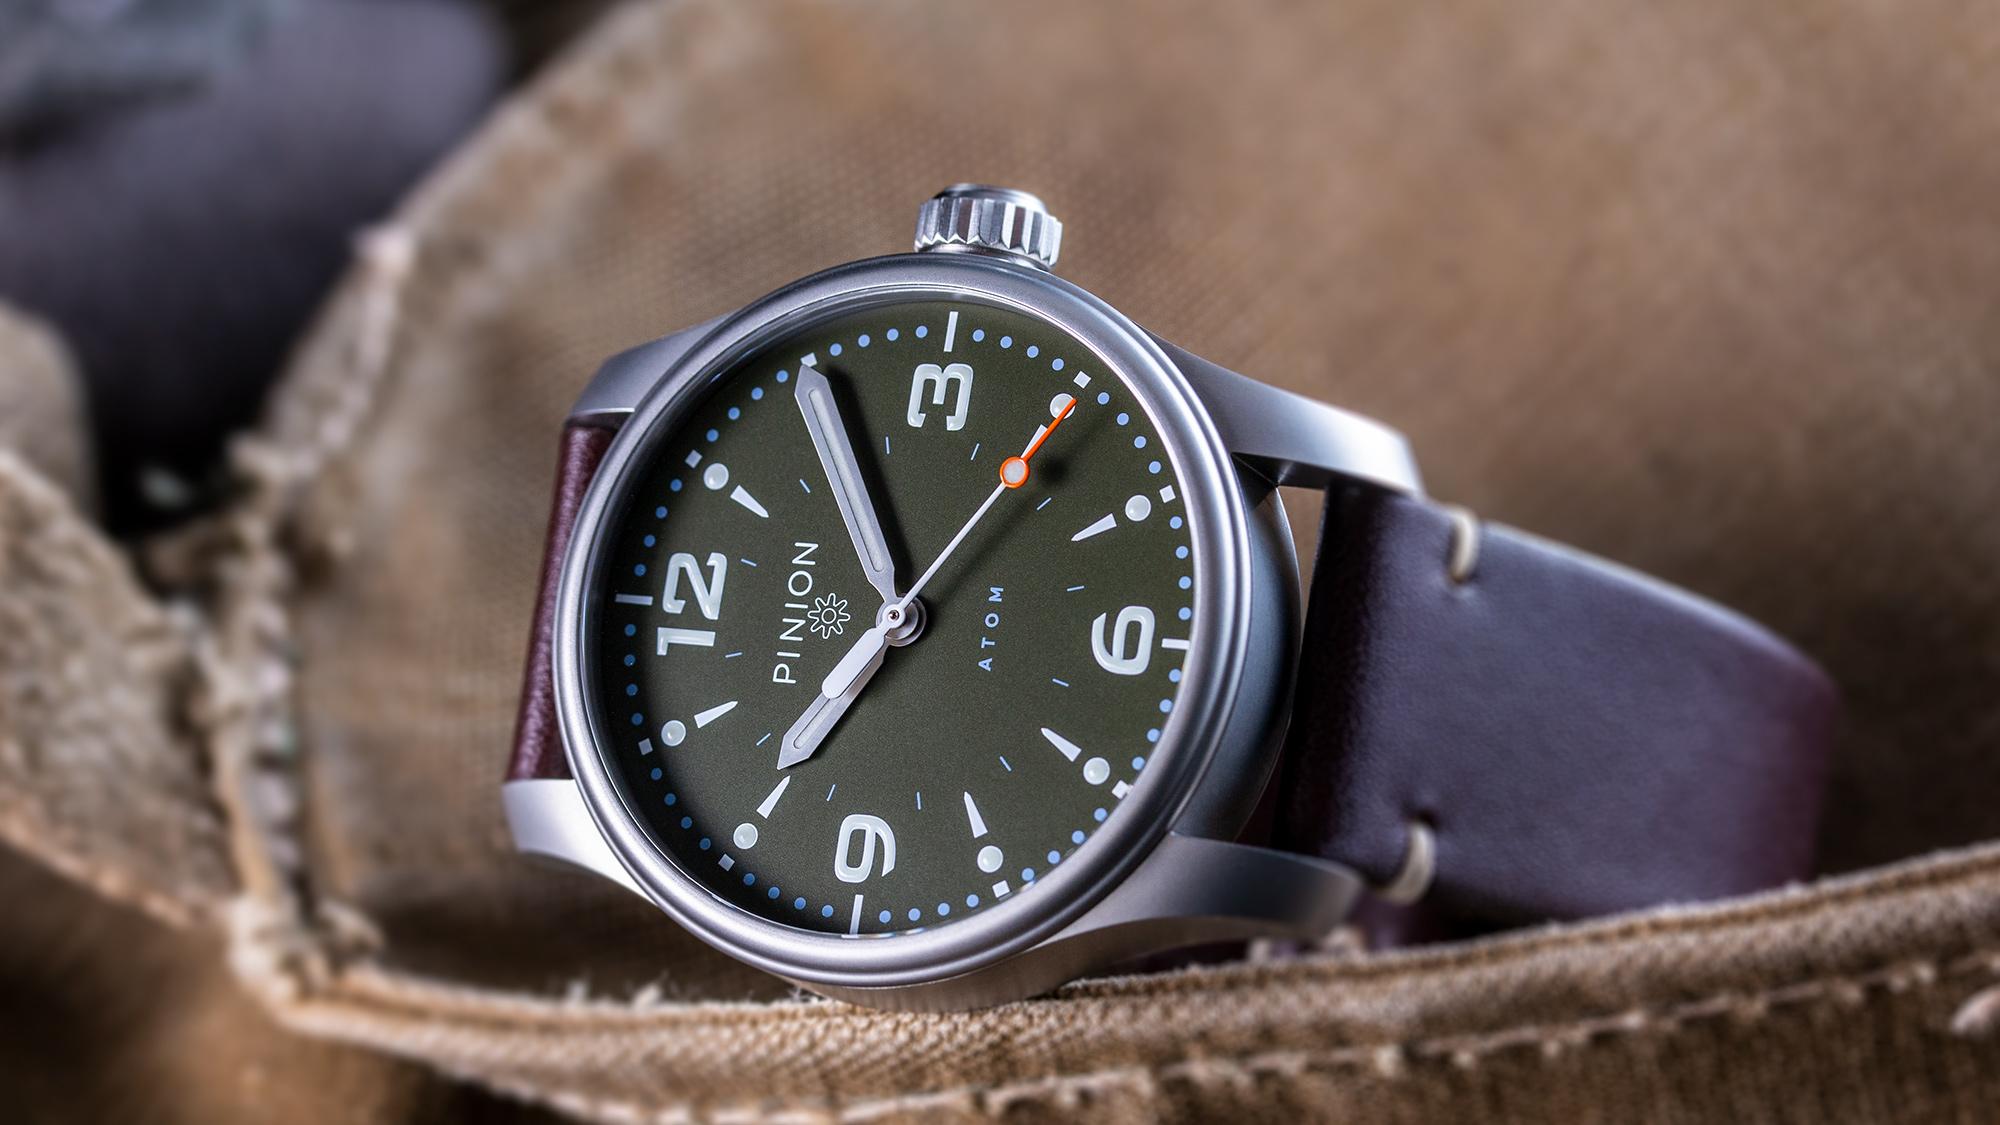 british-watches-pinion-atom-39-no-date-green-dialed-watch